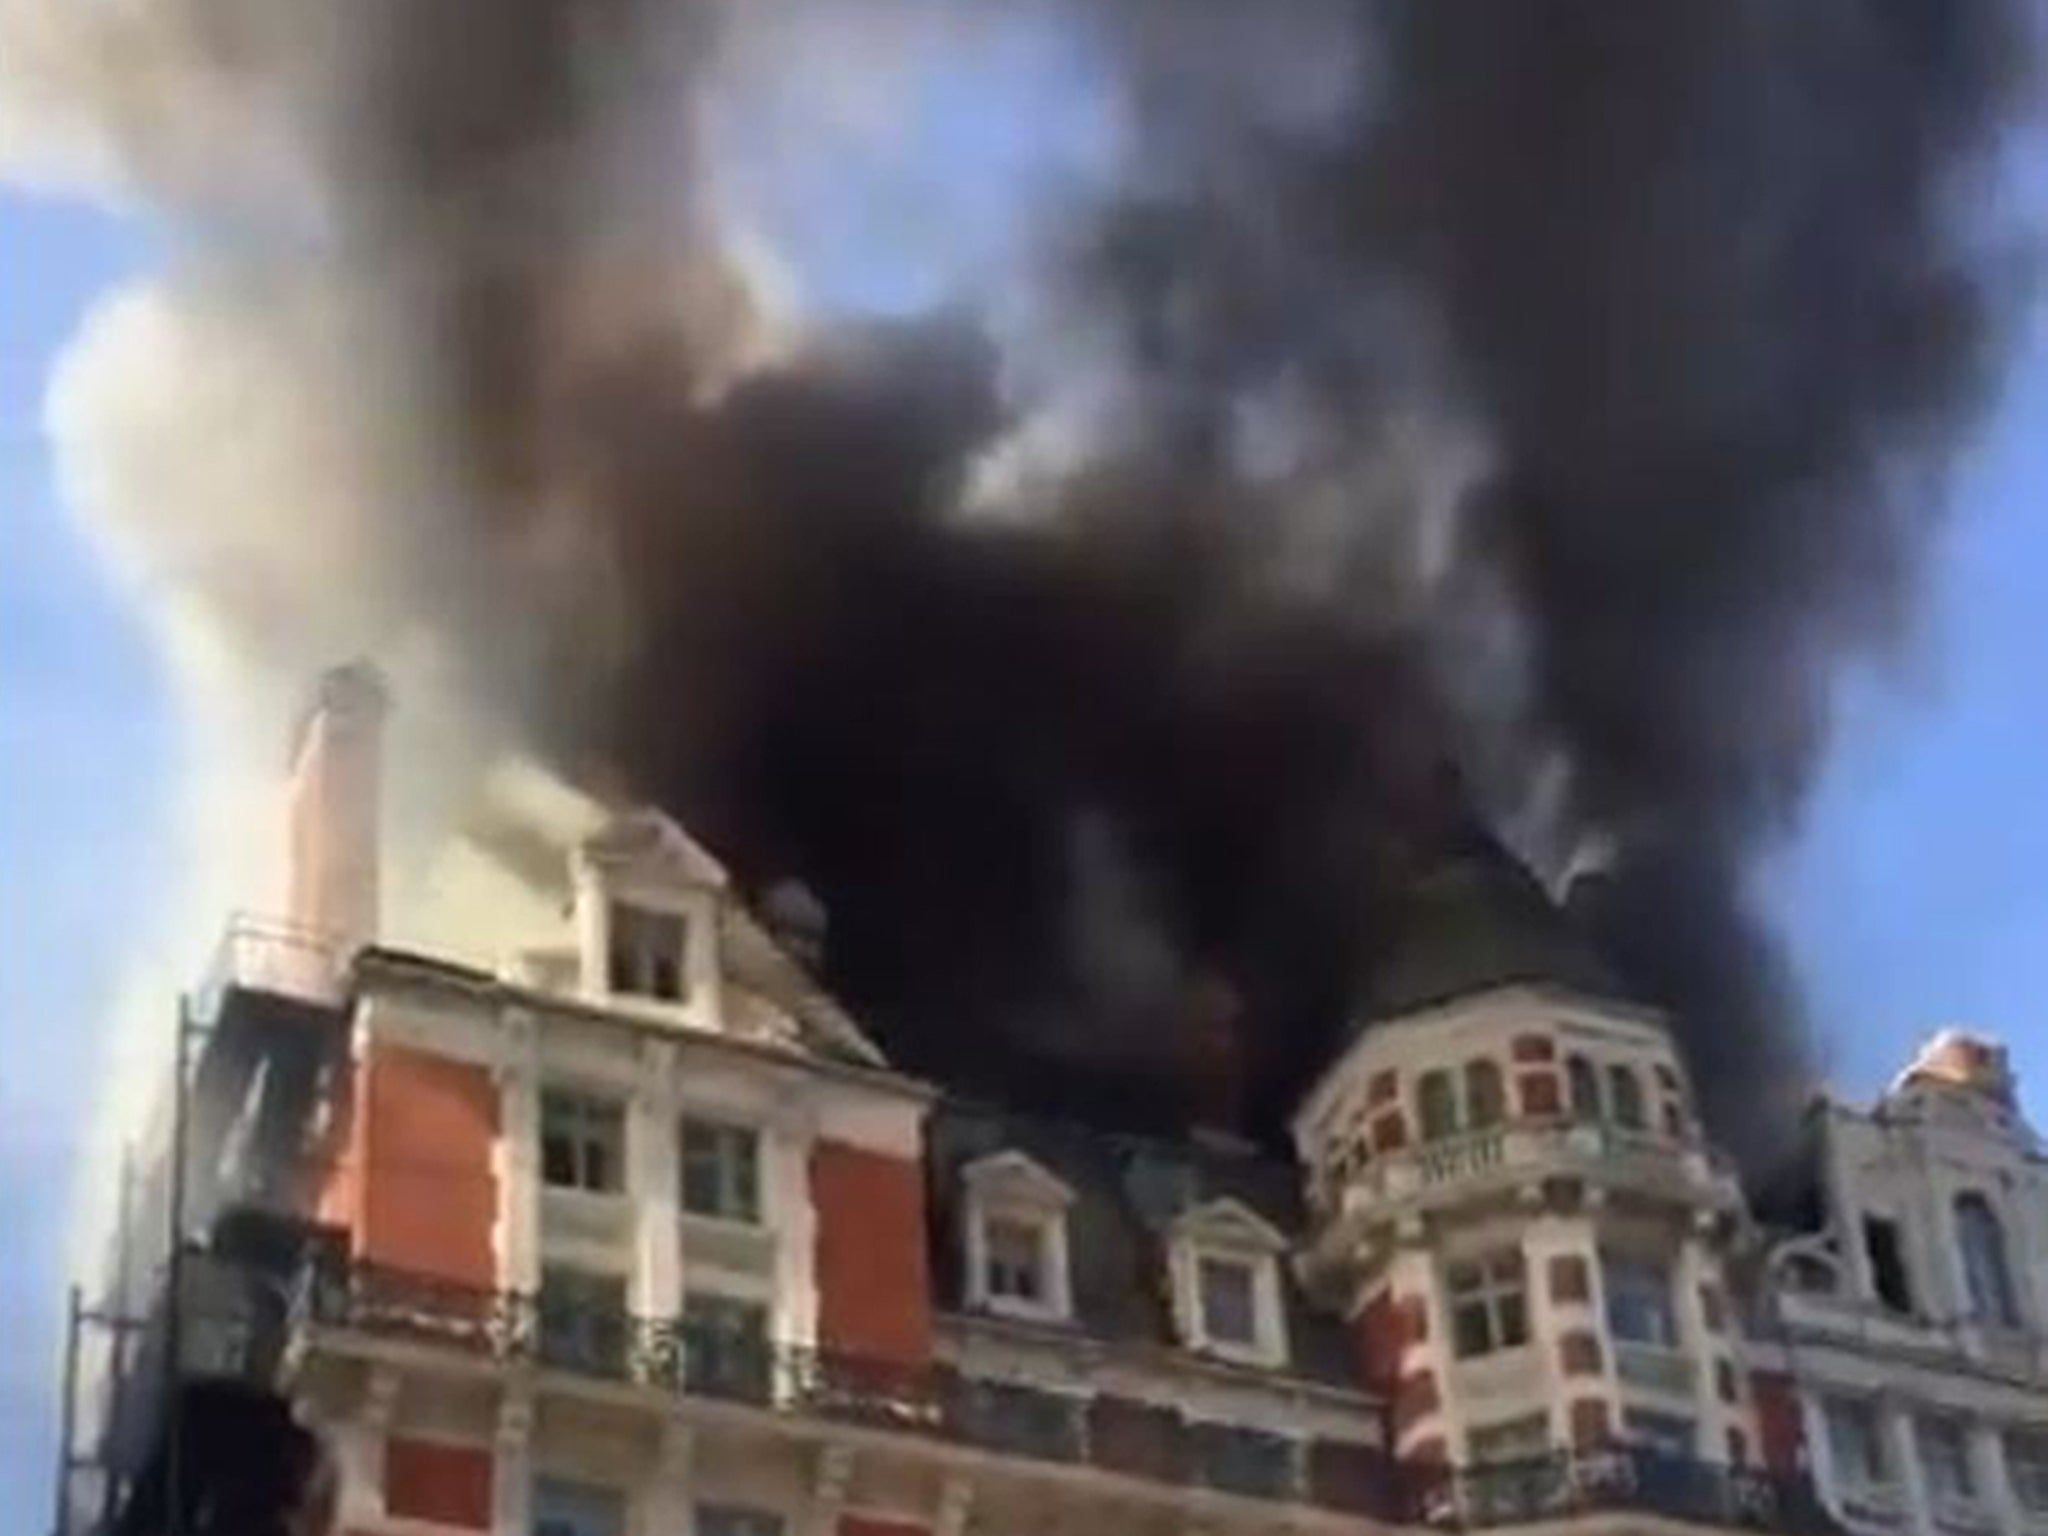 London hotel fire: Huge blaze tackled at Mandarin Oriental Hotel in Knightsbridge | The Independentindependent_brand_ident_LOGOUntitled